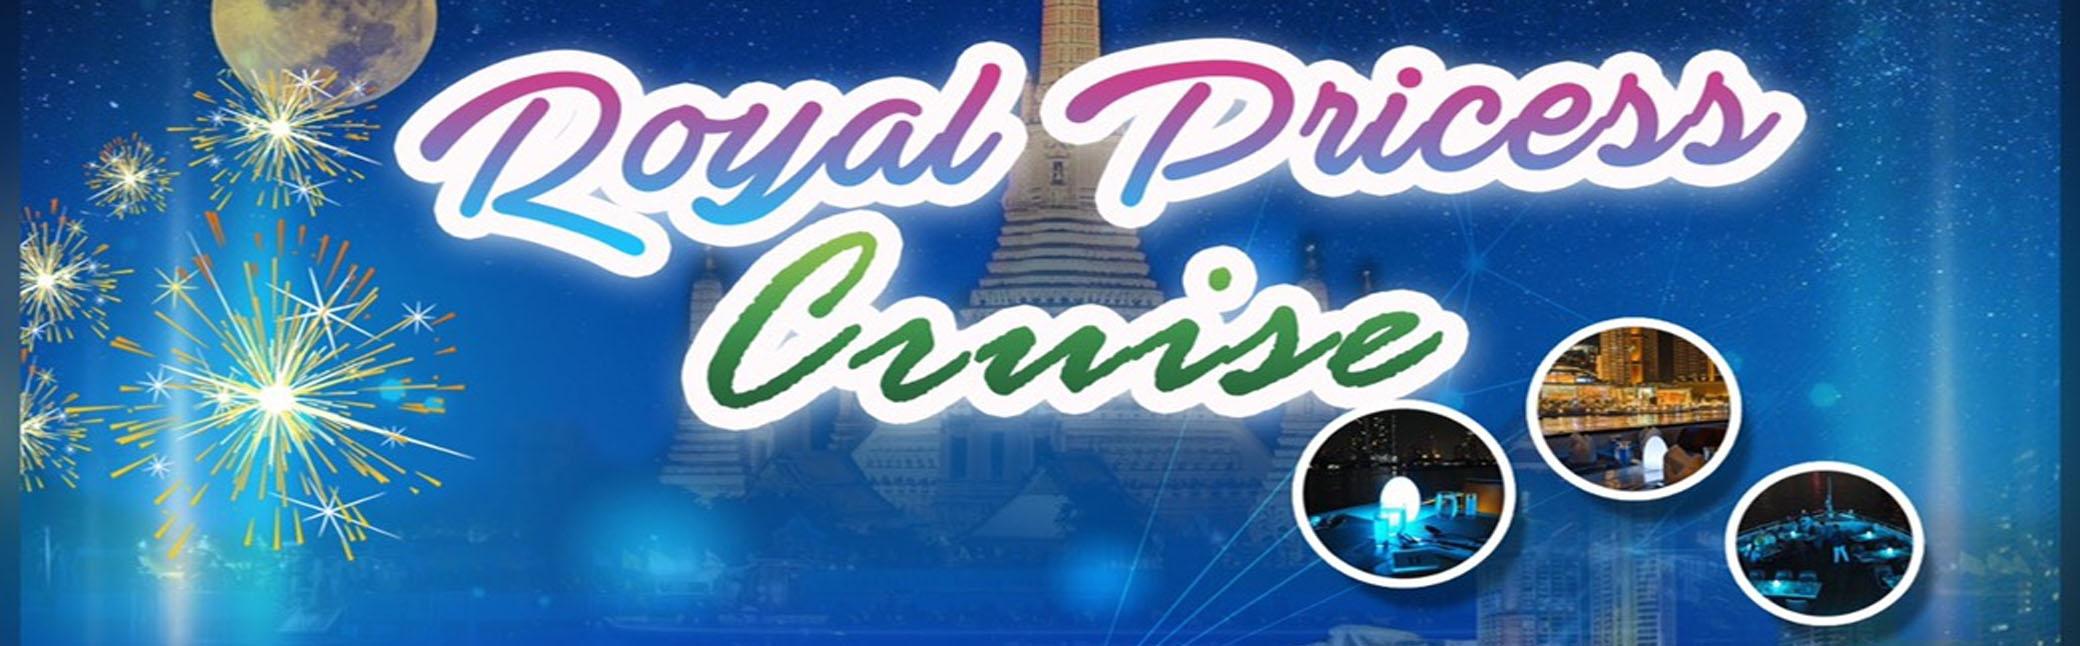 Royal Princess Cruise  ล่องเรือแม่น้ำเจ้าพระยา ดินเนอร์  Seafood Buffet by เรือสำราญ